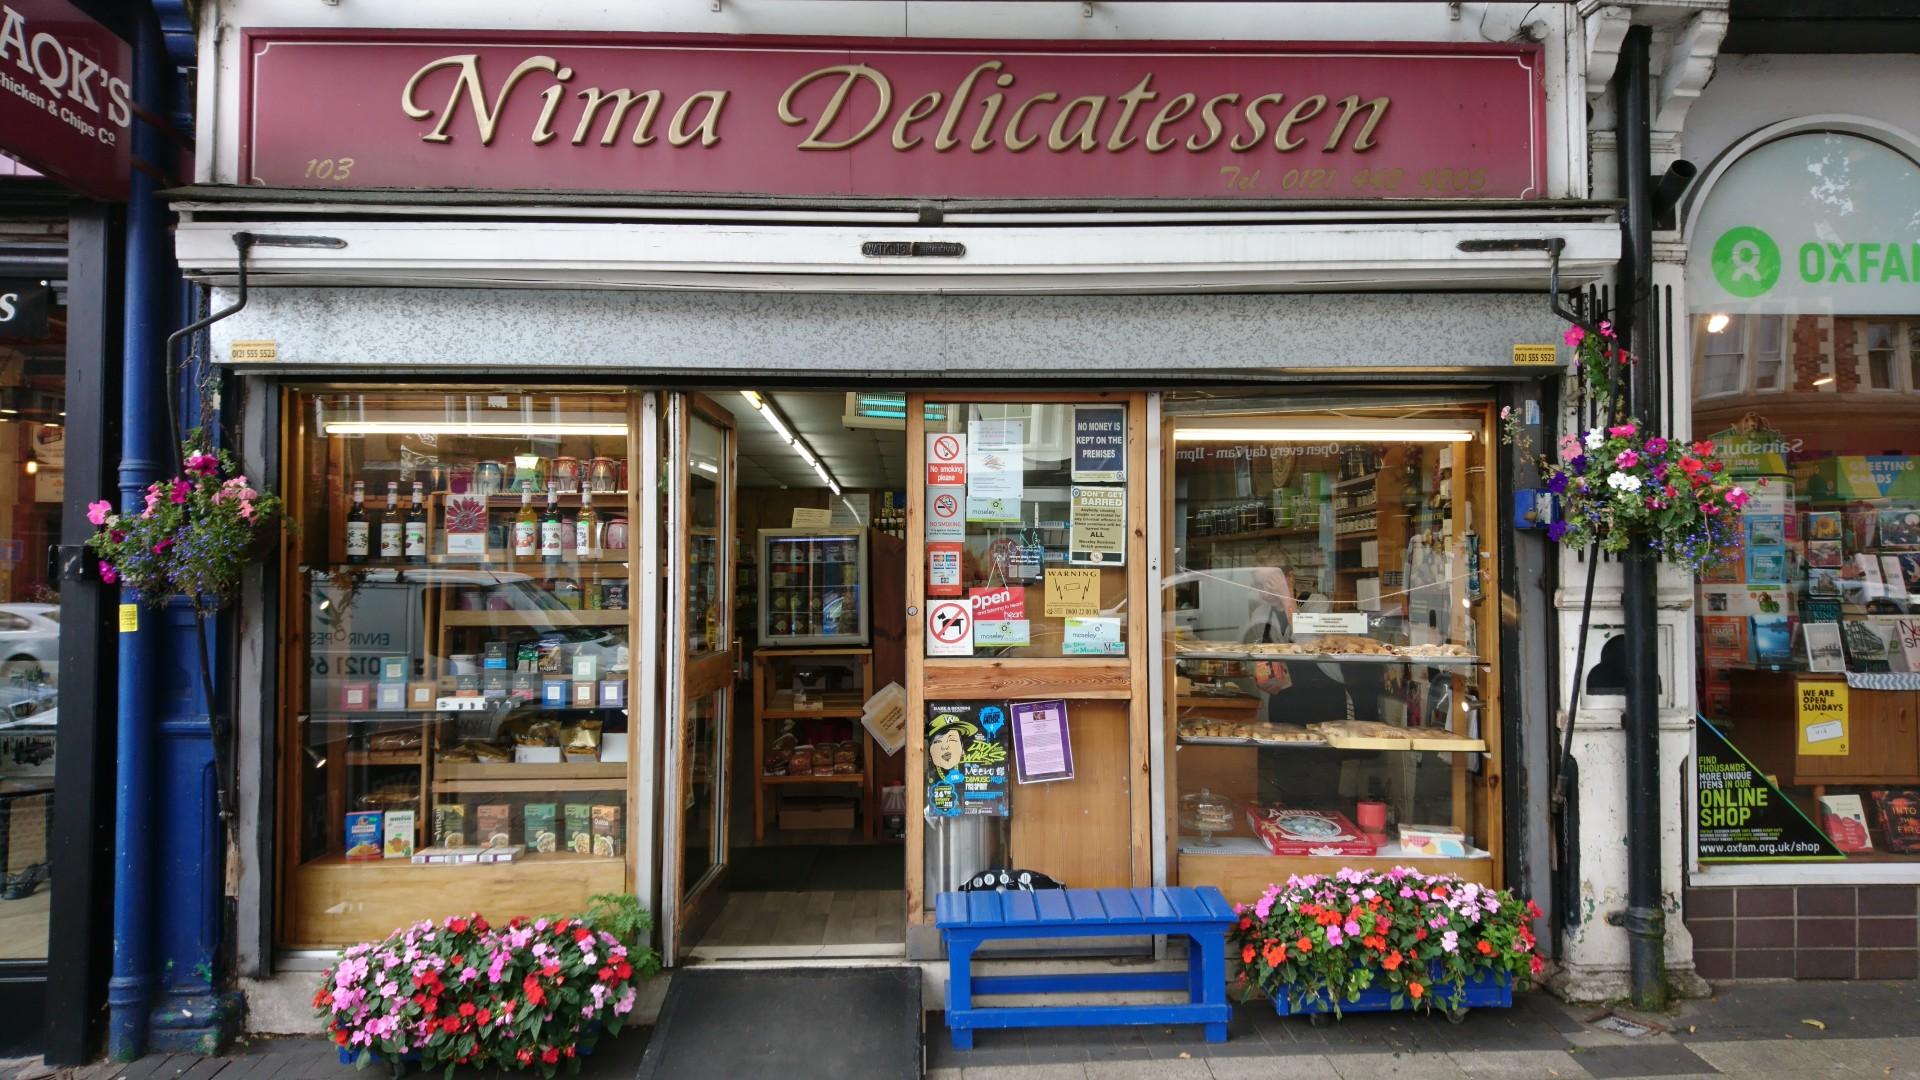 Nima Delicatessen